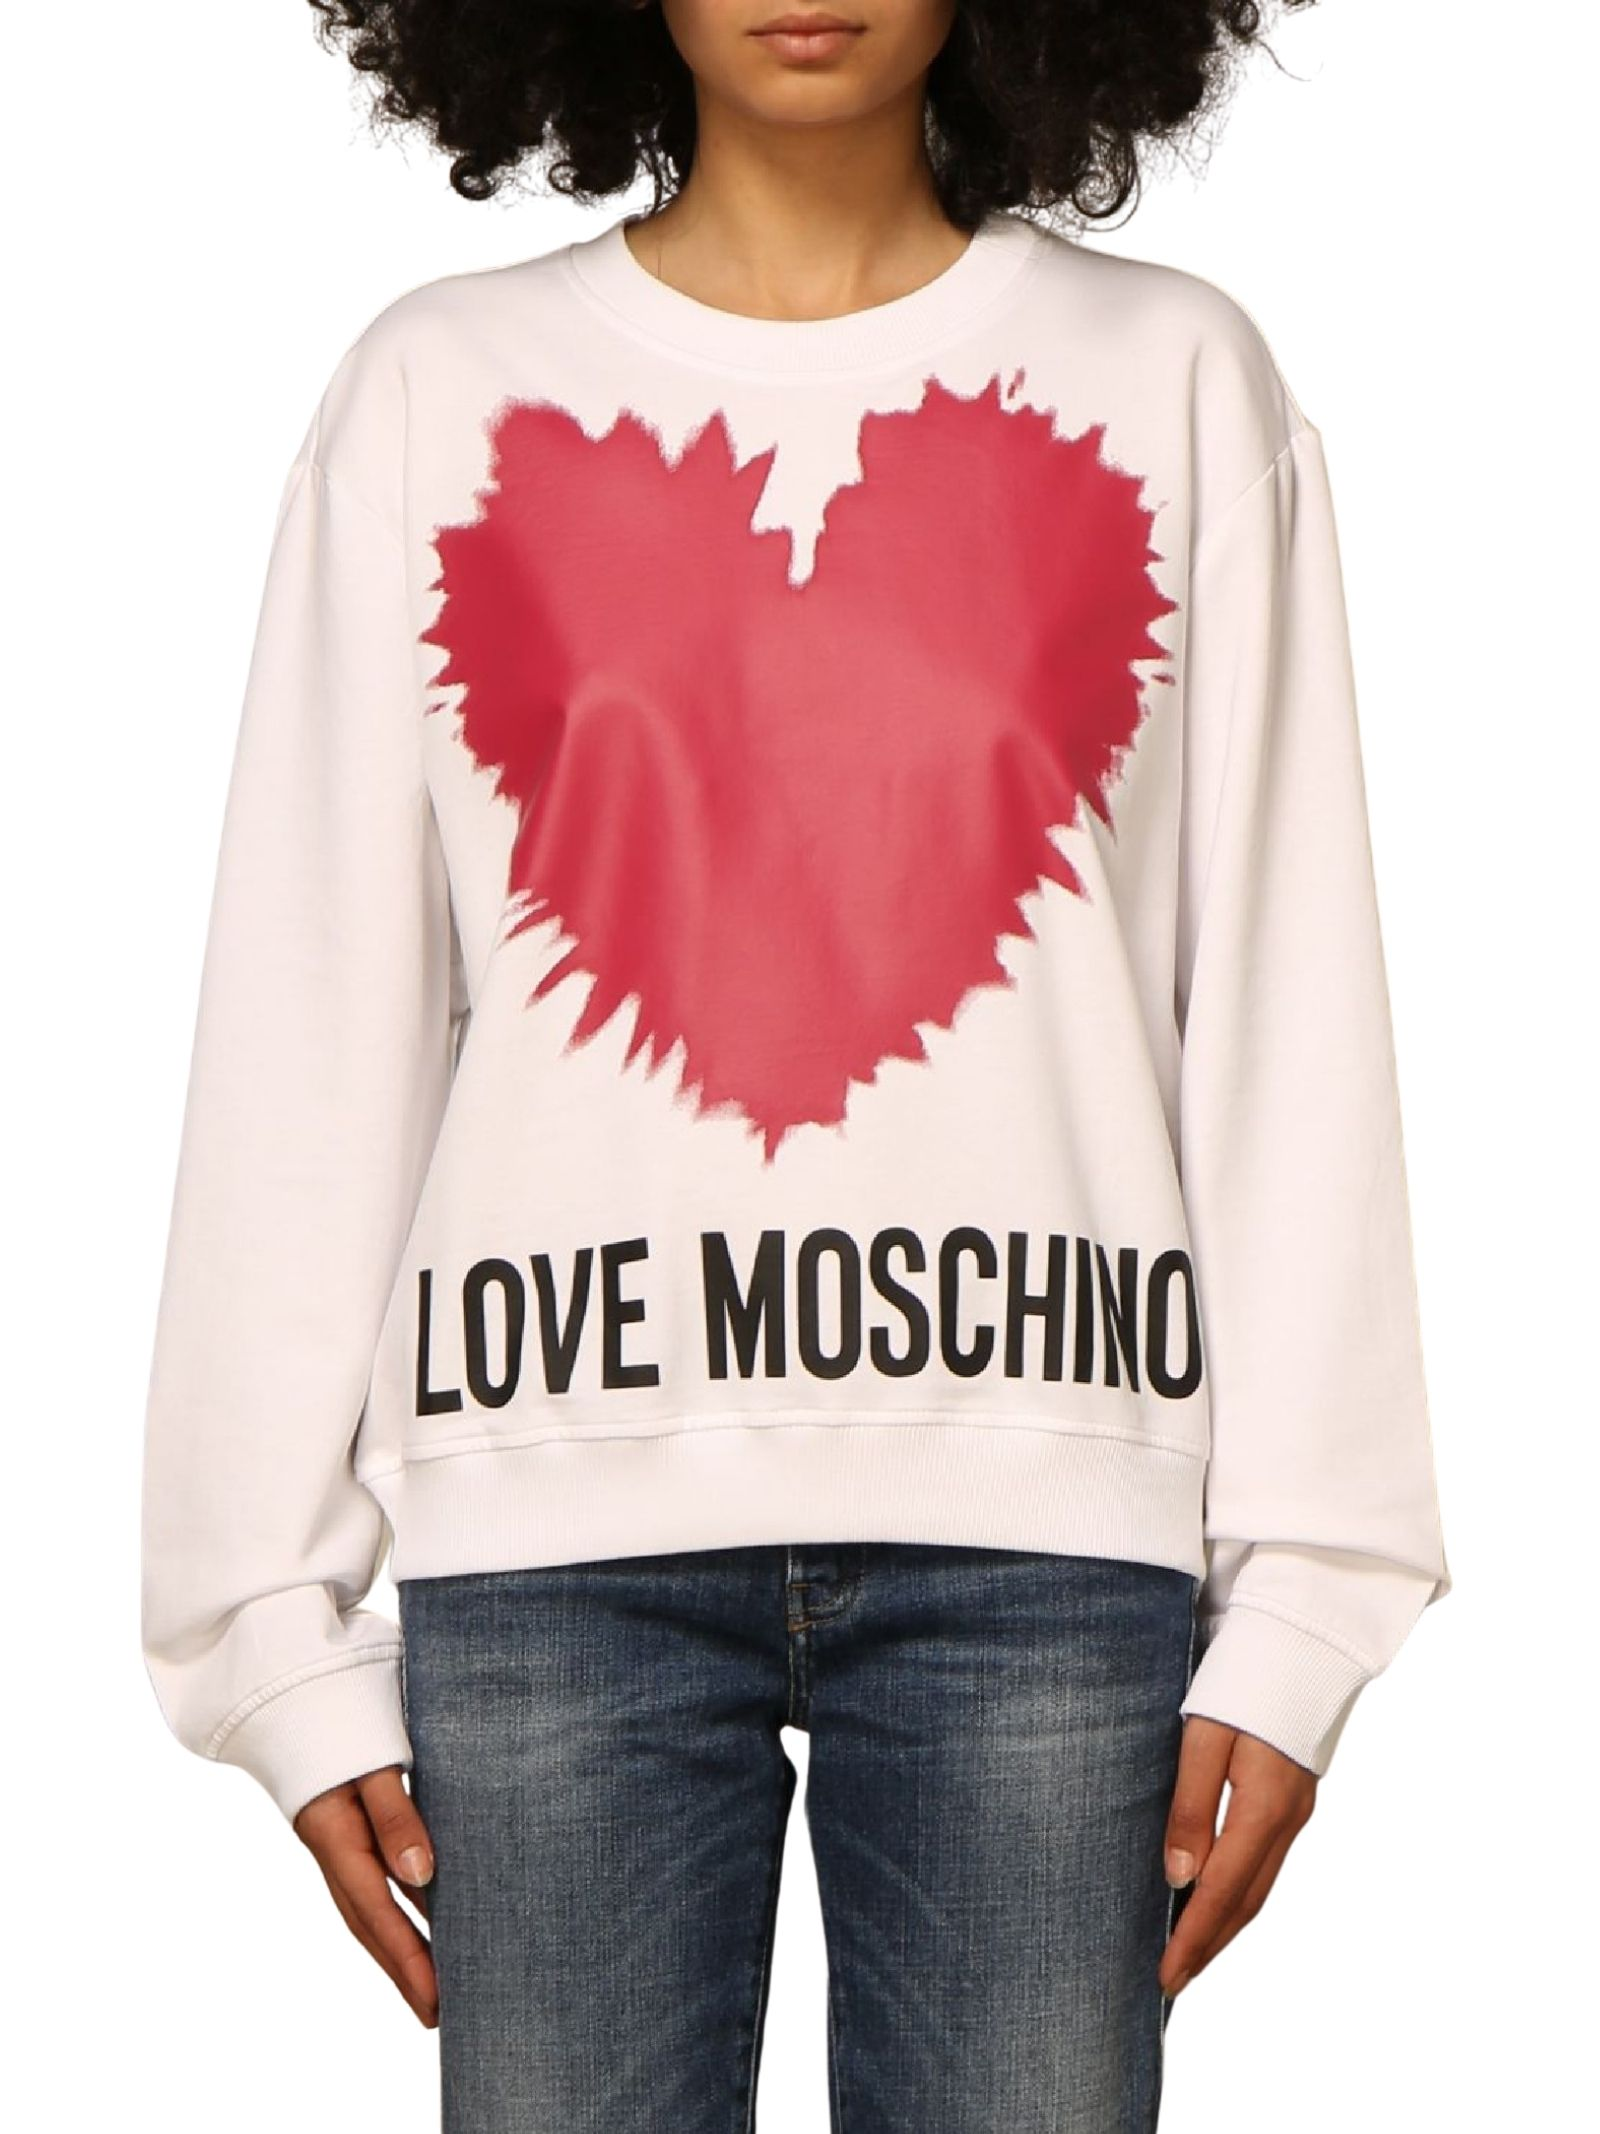 MOSCHINO LOVE | Felpa | W 6 306 43 M 4282A00